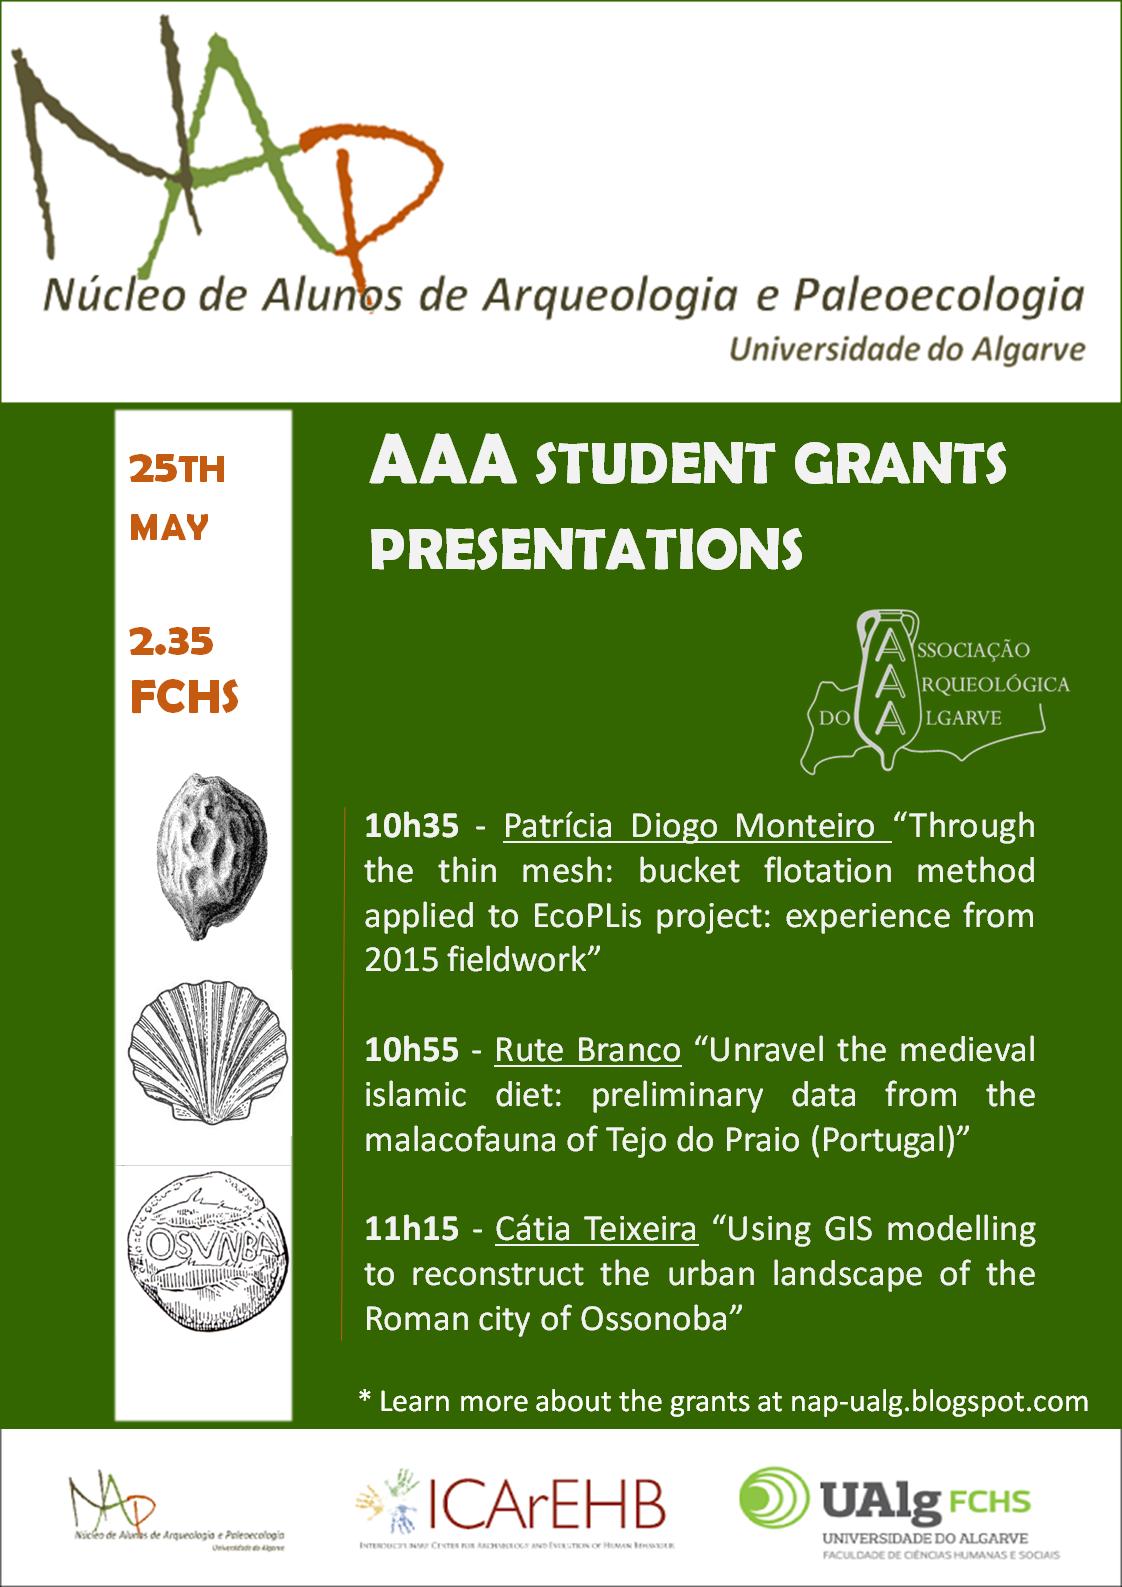 AAA student grants presentations